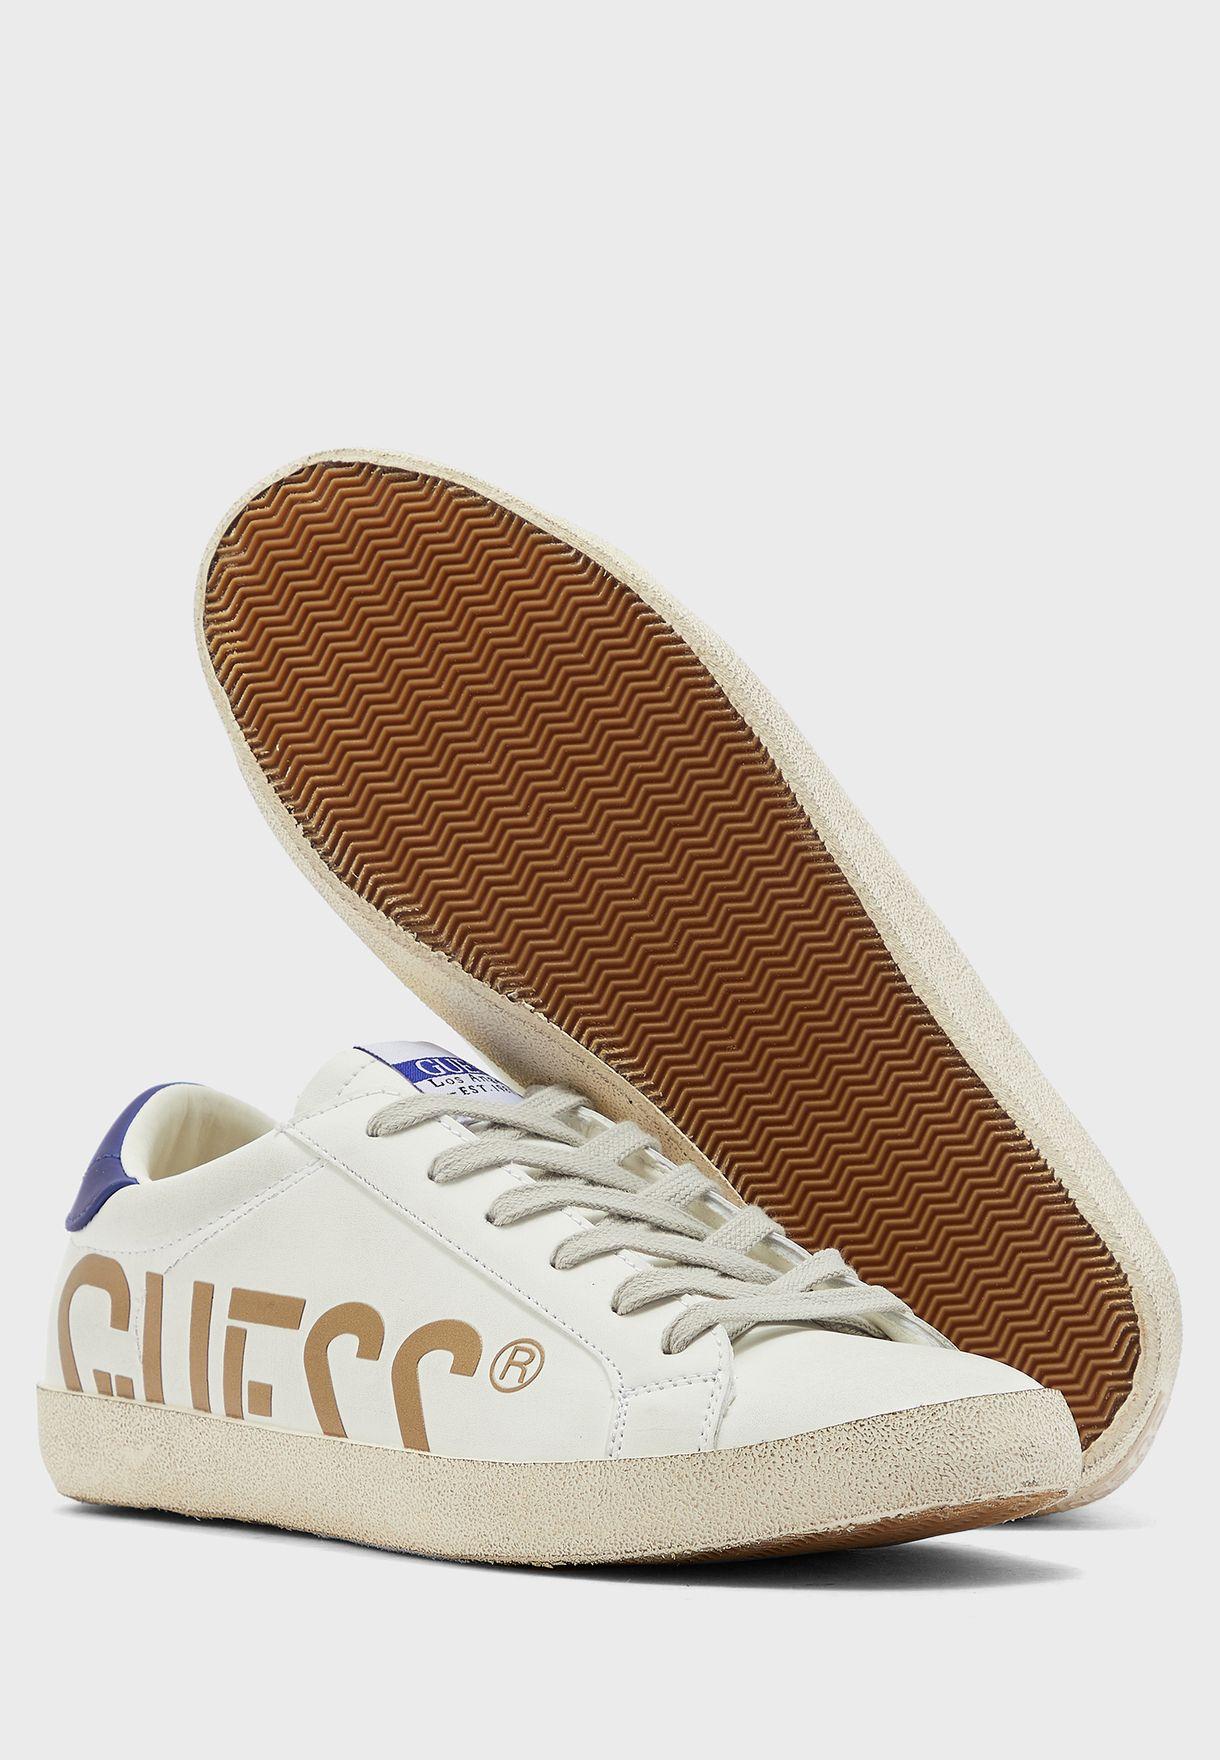 Ryan Sneakers